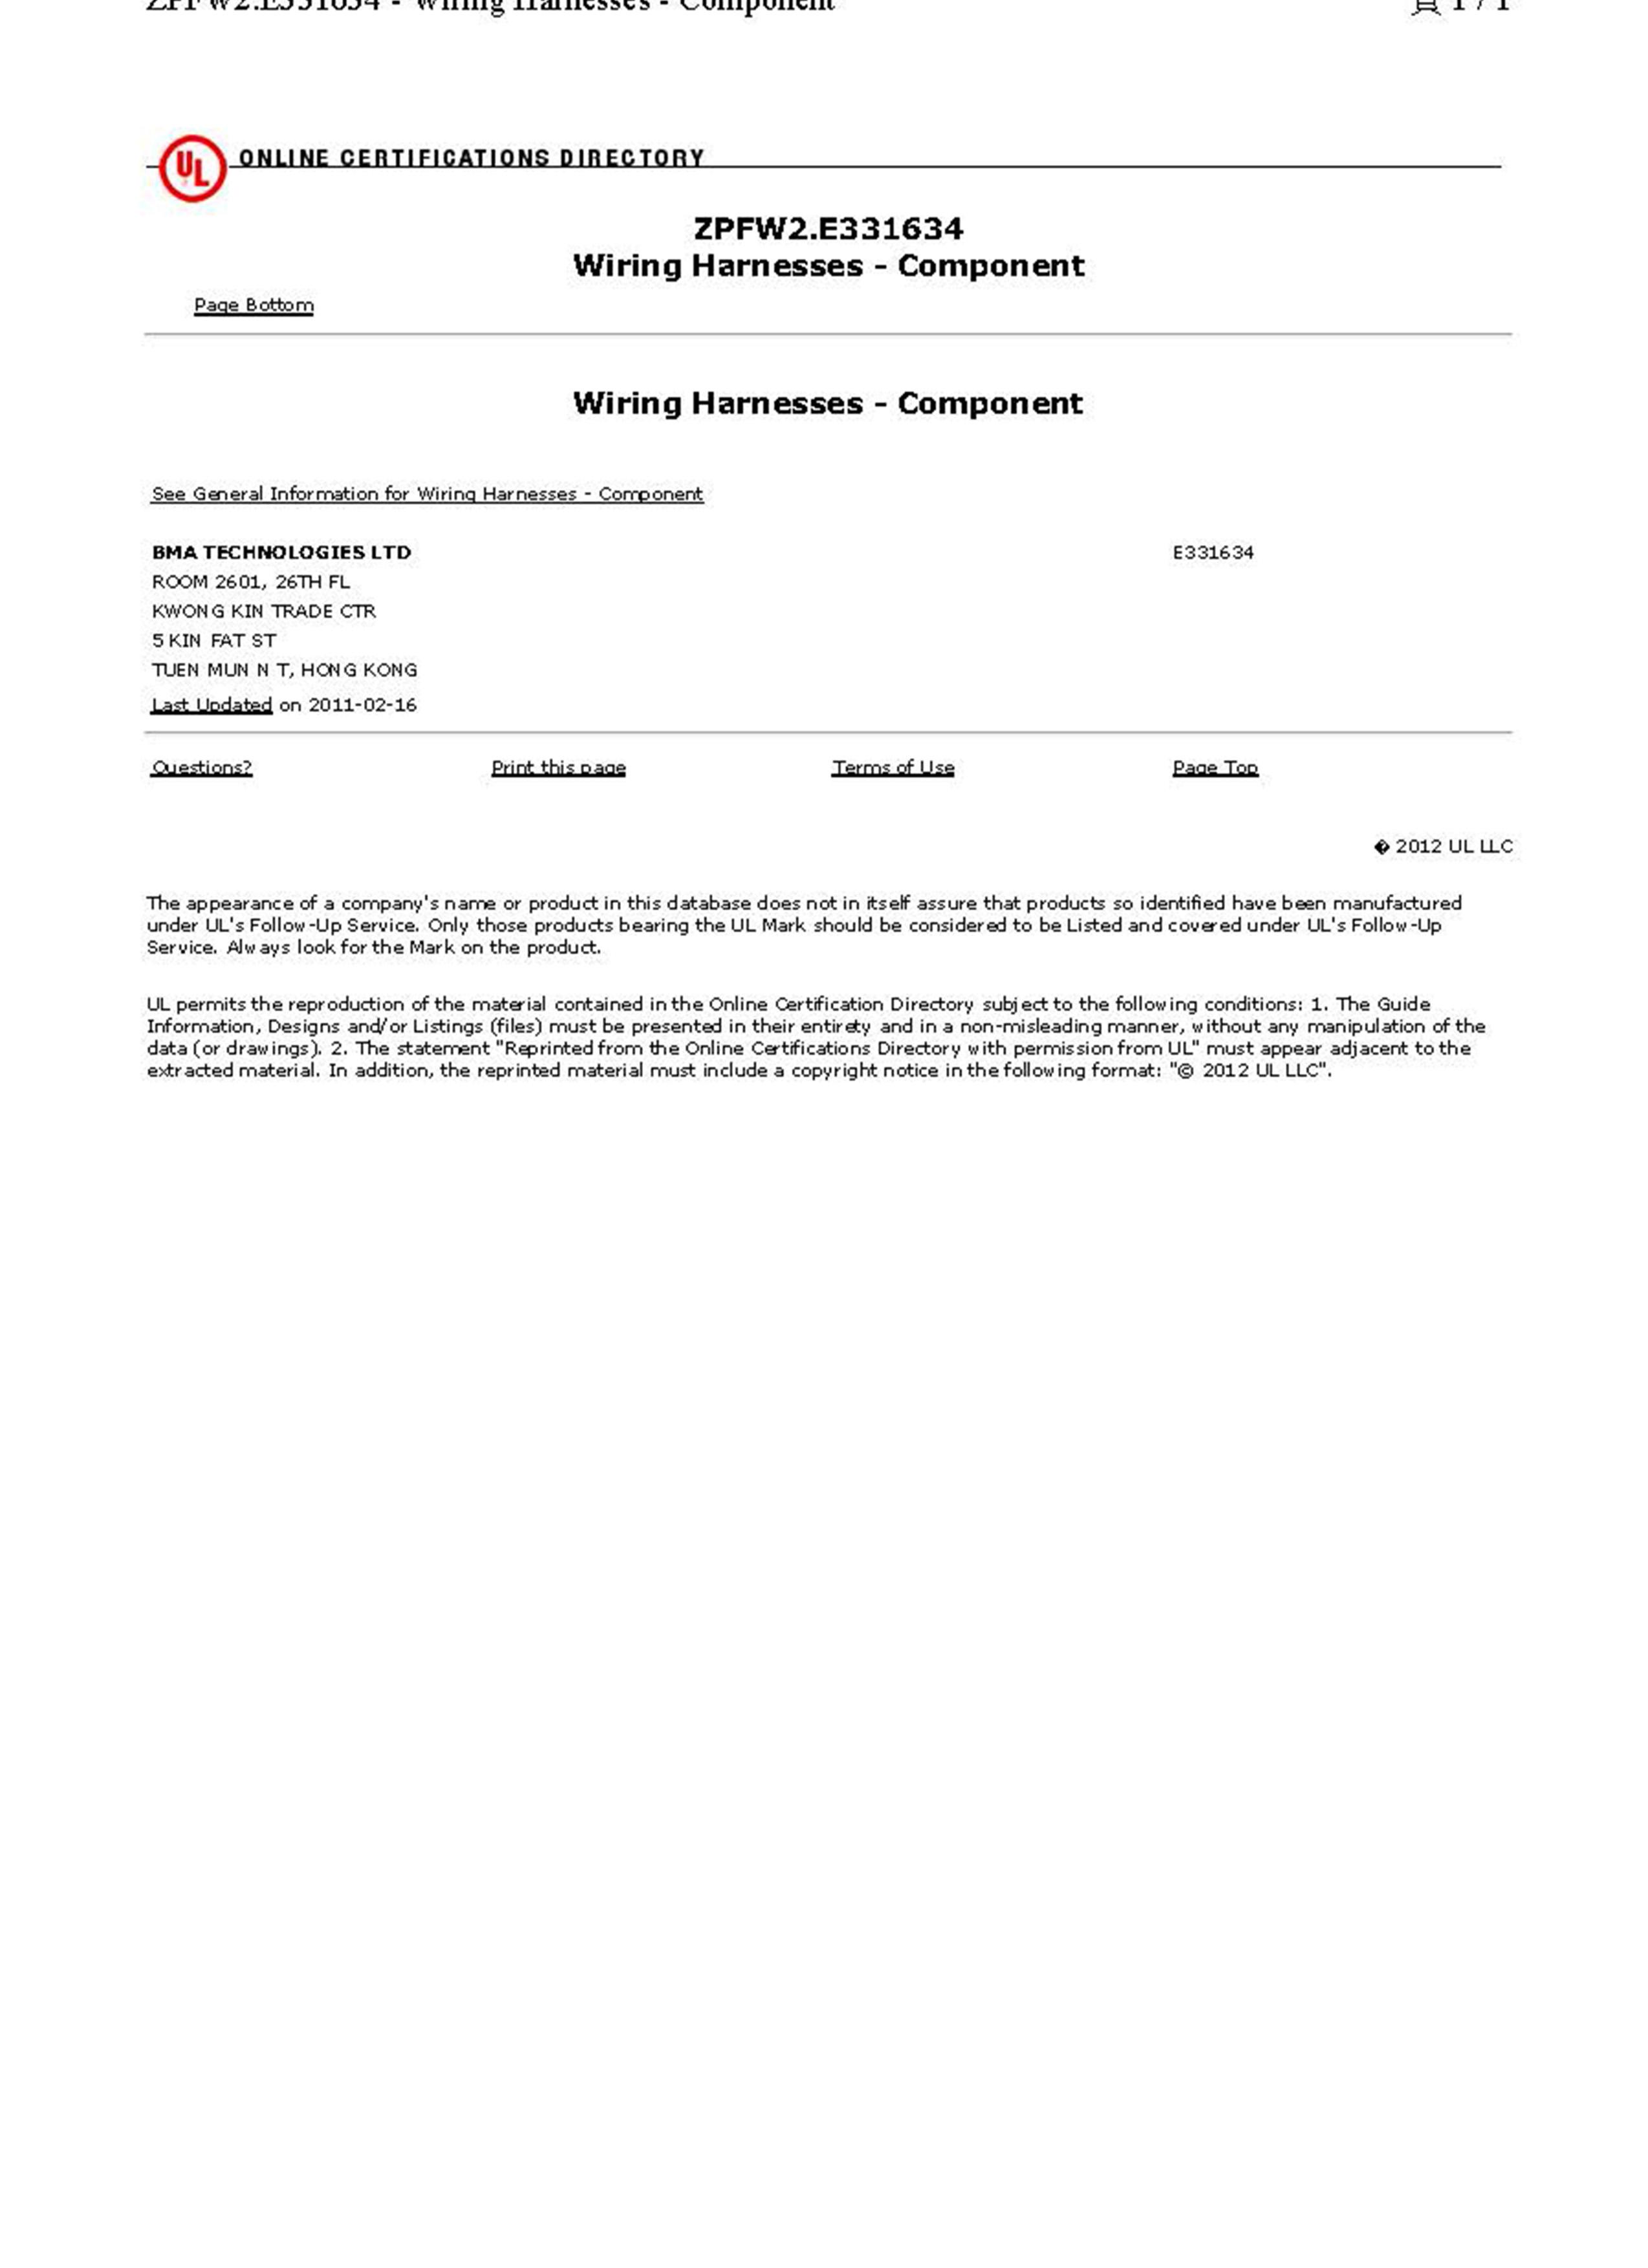 Online Certification Ul Online Certification Directory